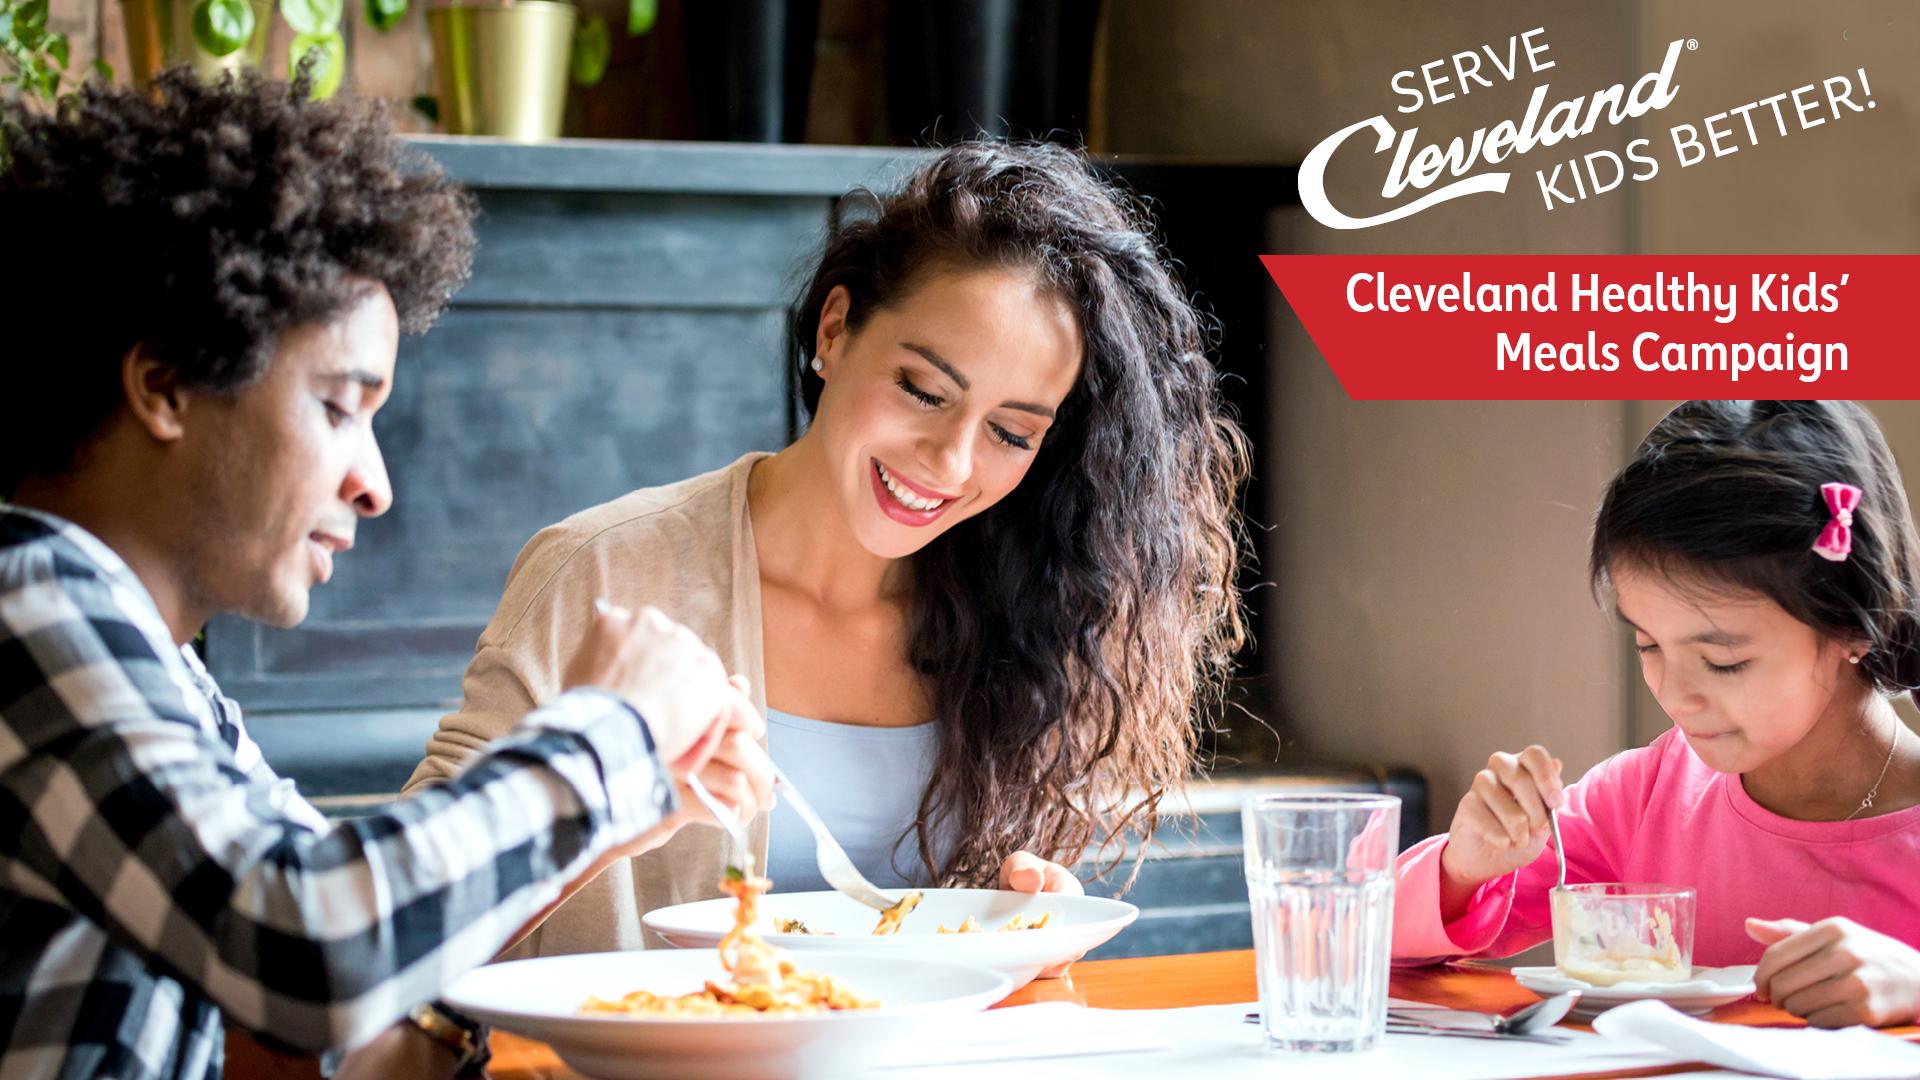 Serve Kids Better, Cleveland!